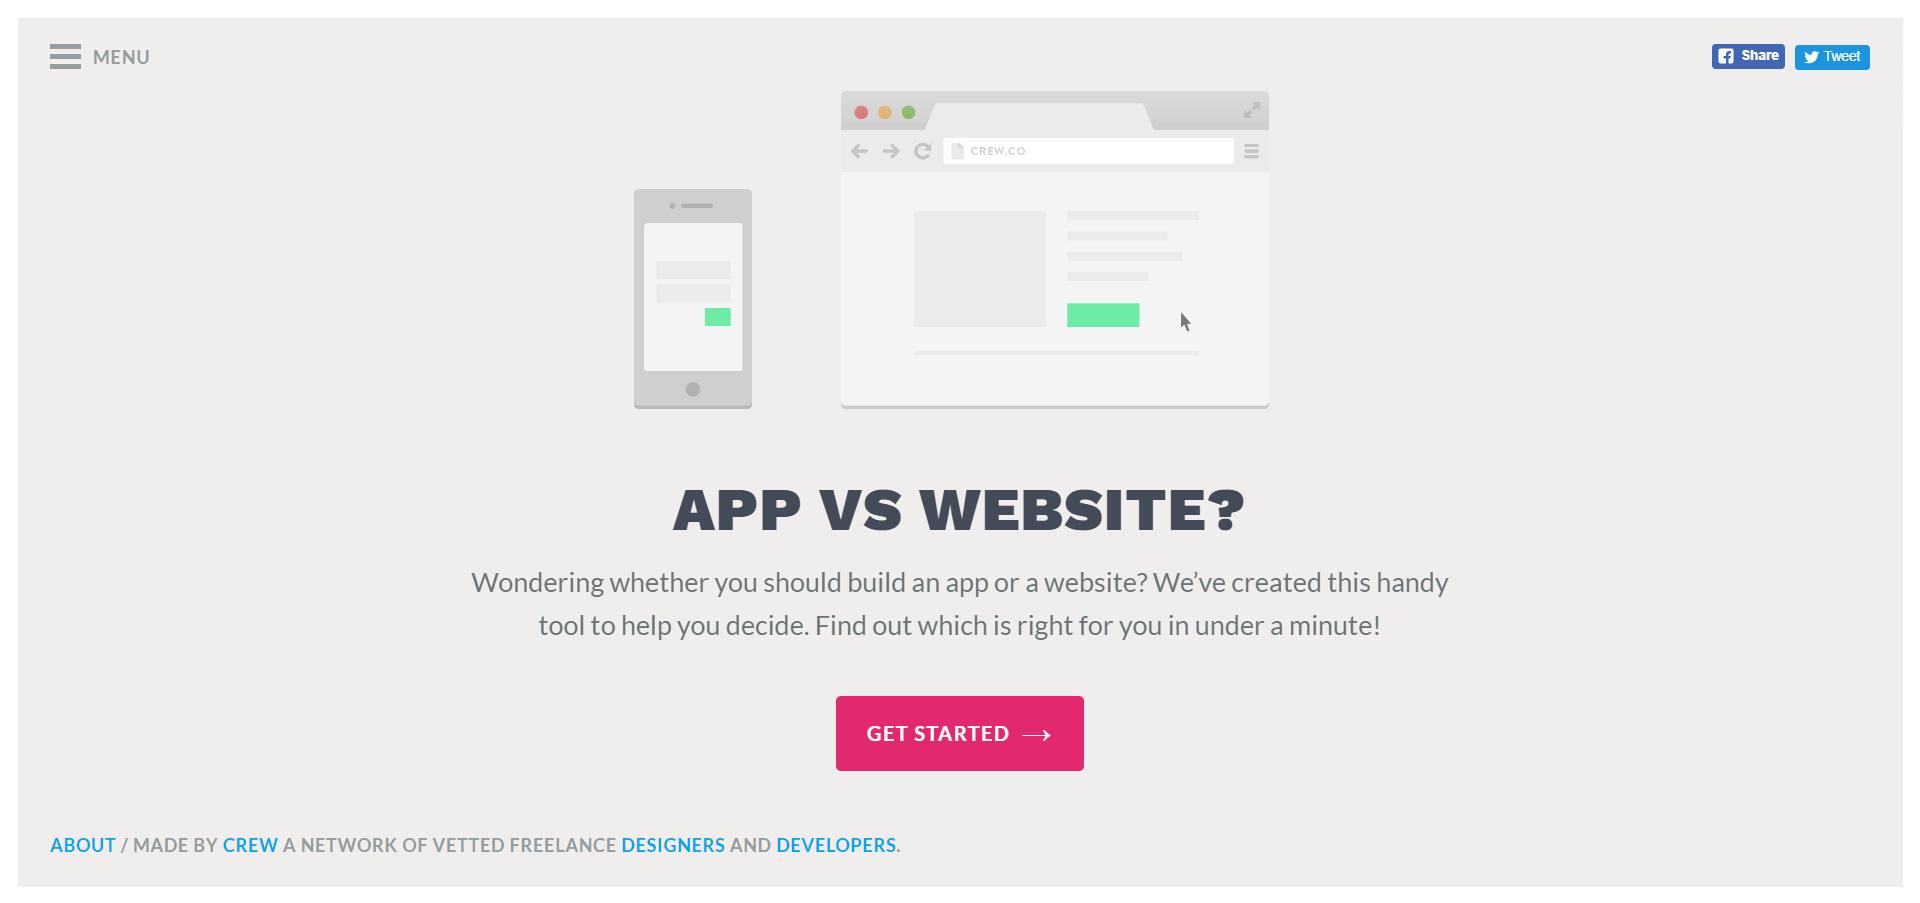 App vs. Website website image